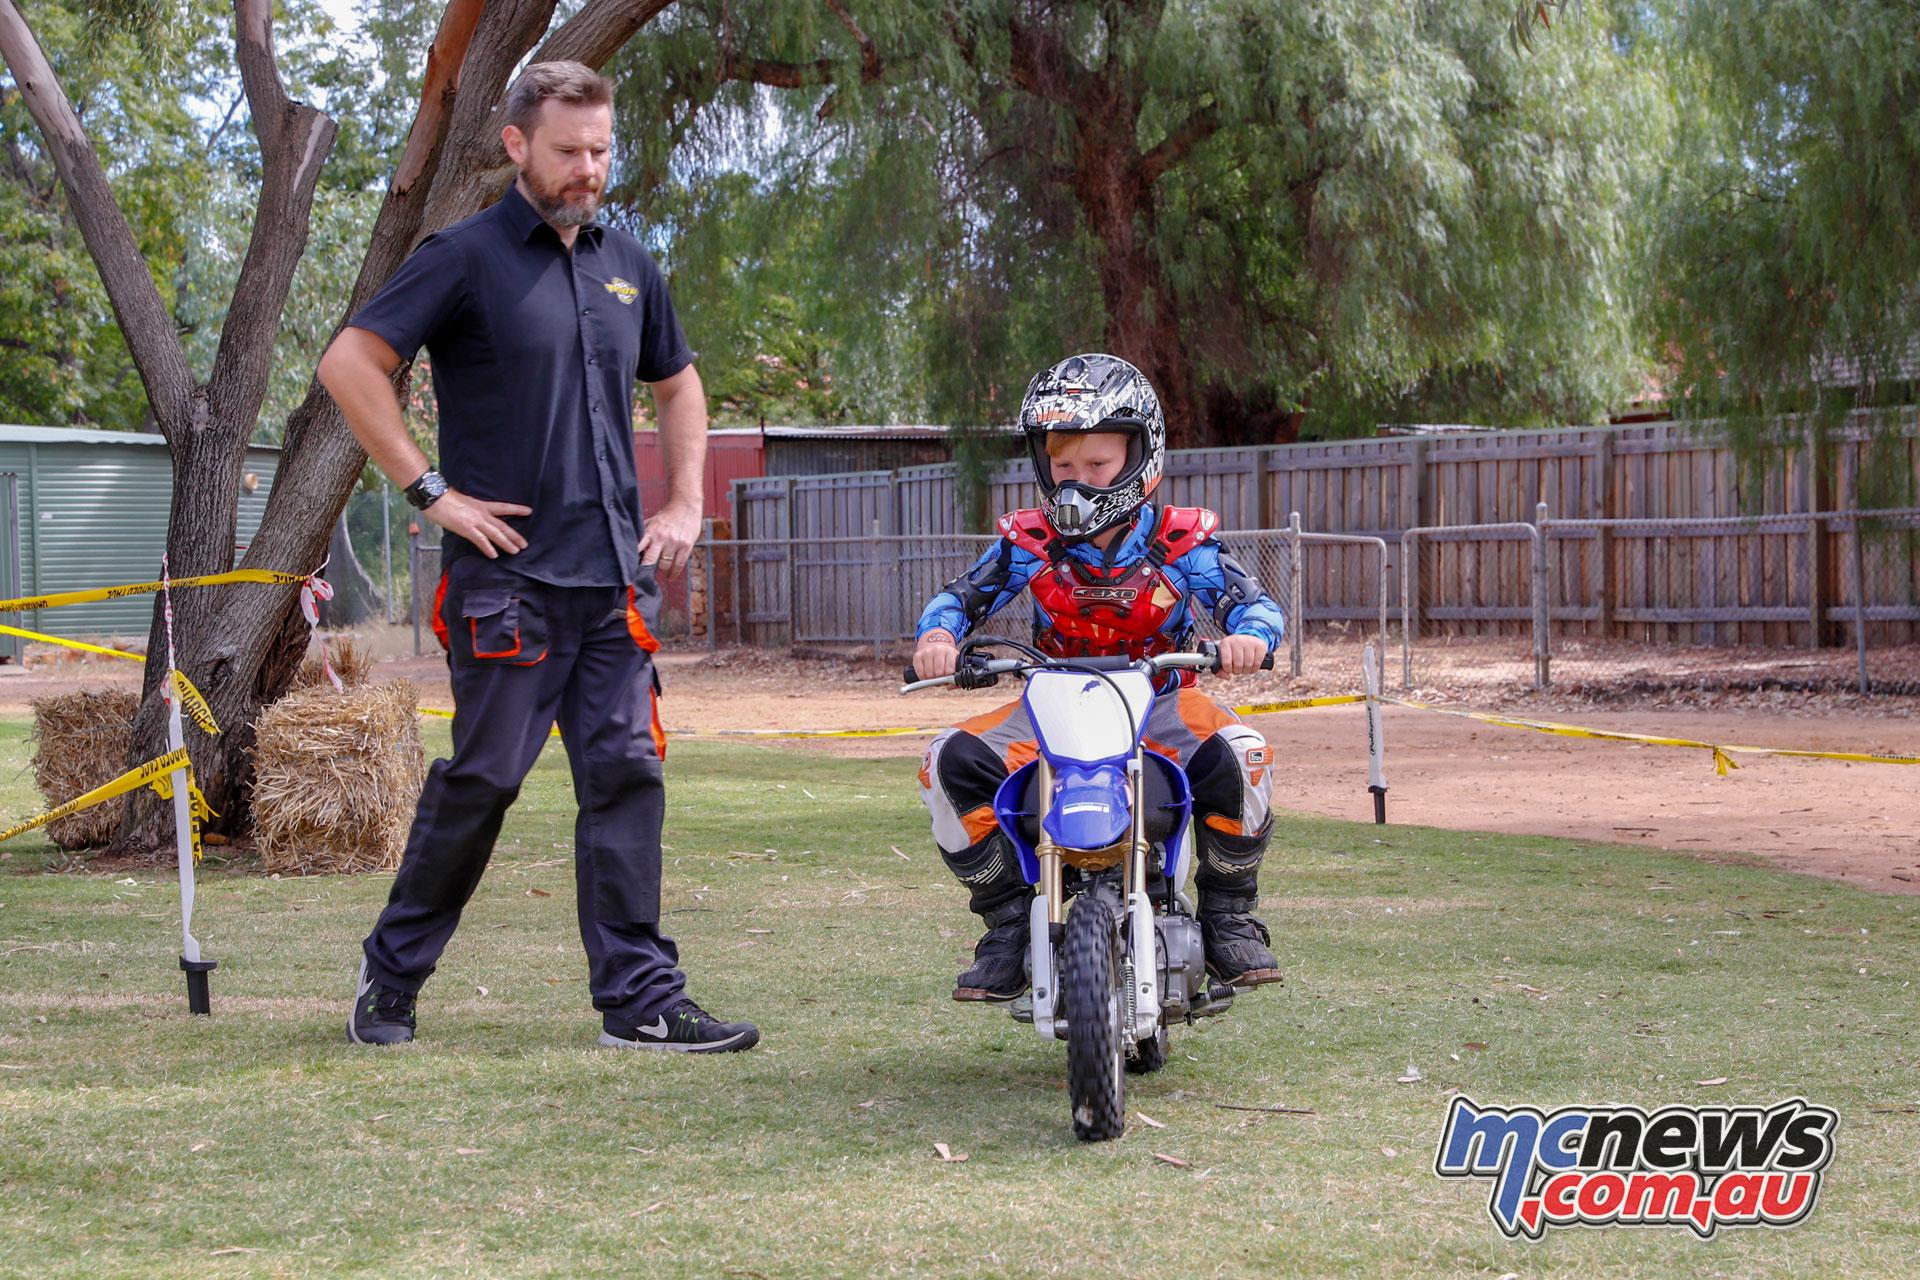 York Motorcycle Festival Kids Motorbike Rides